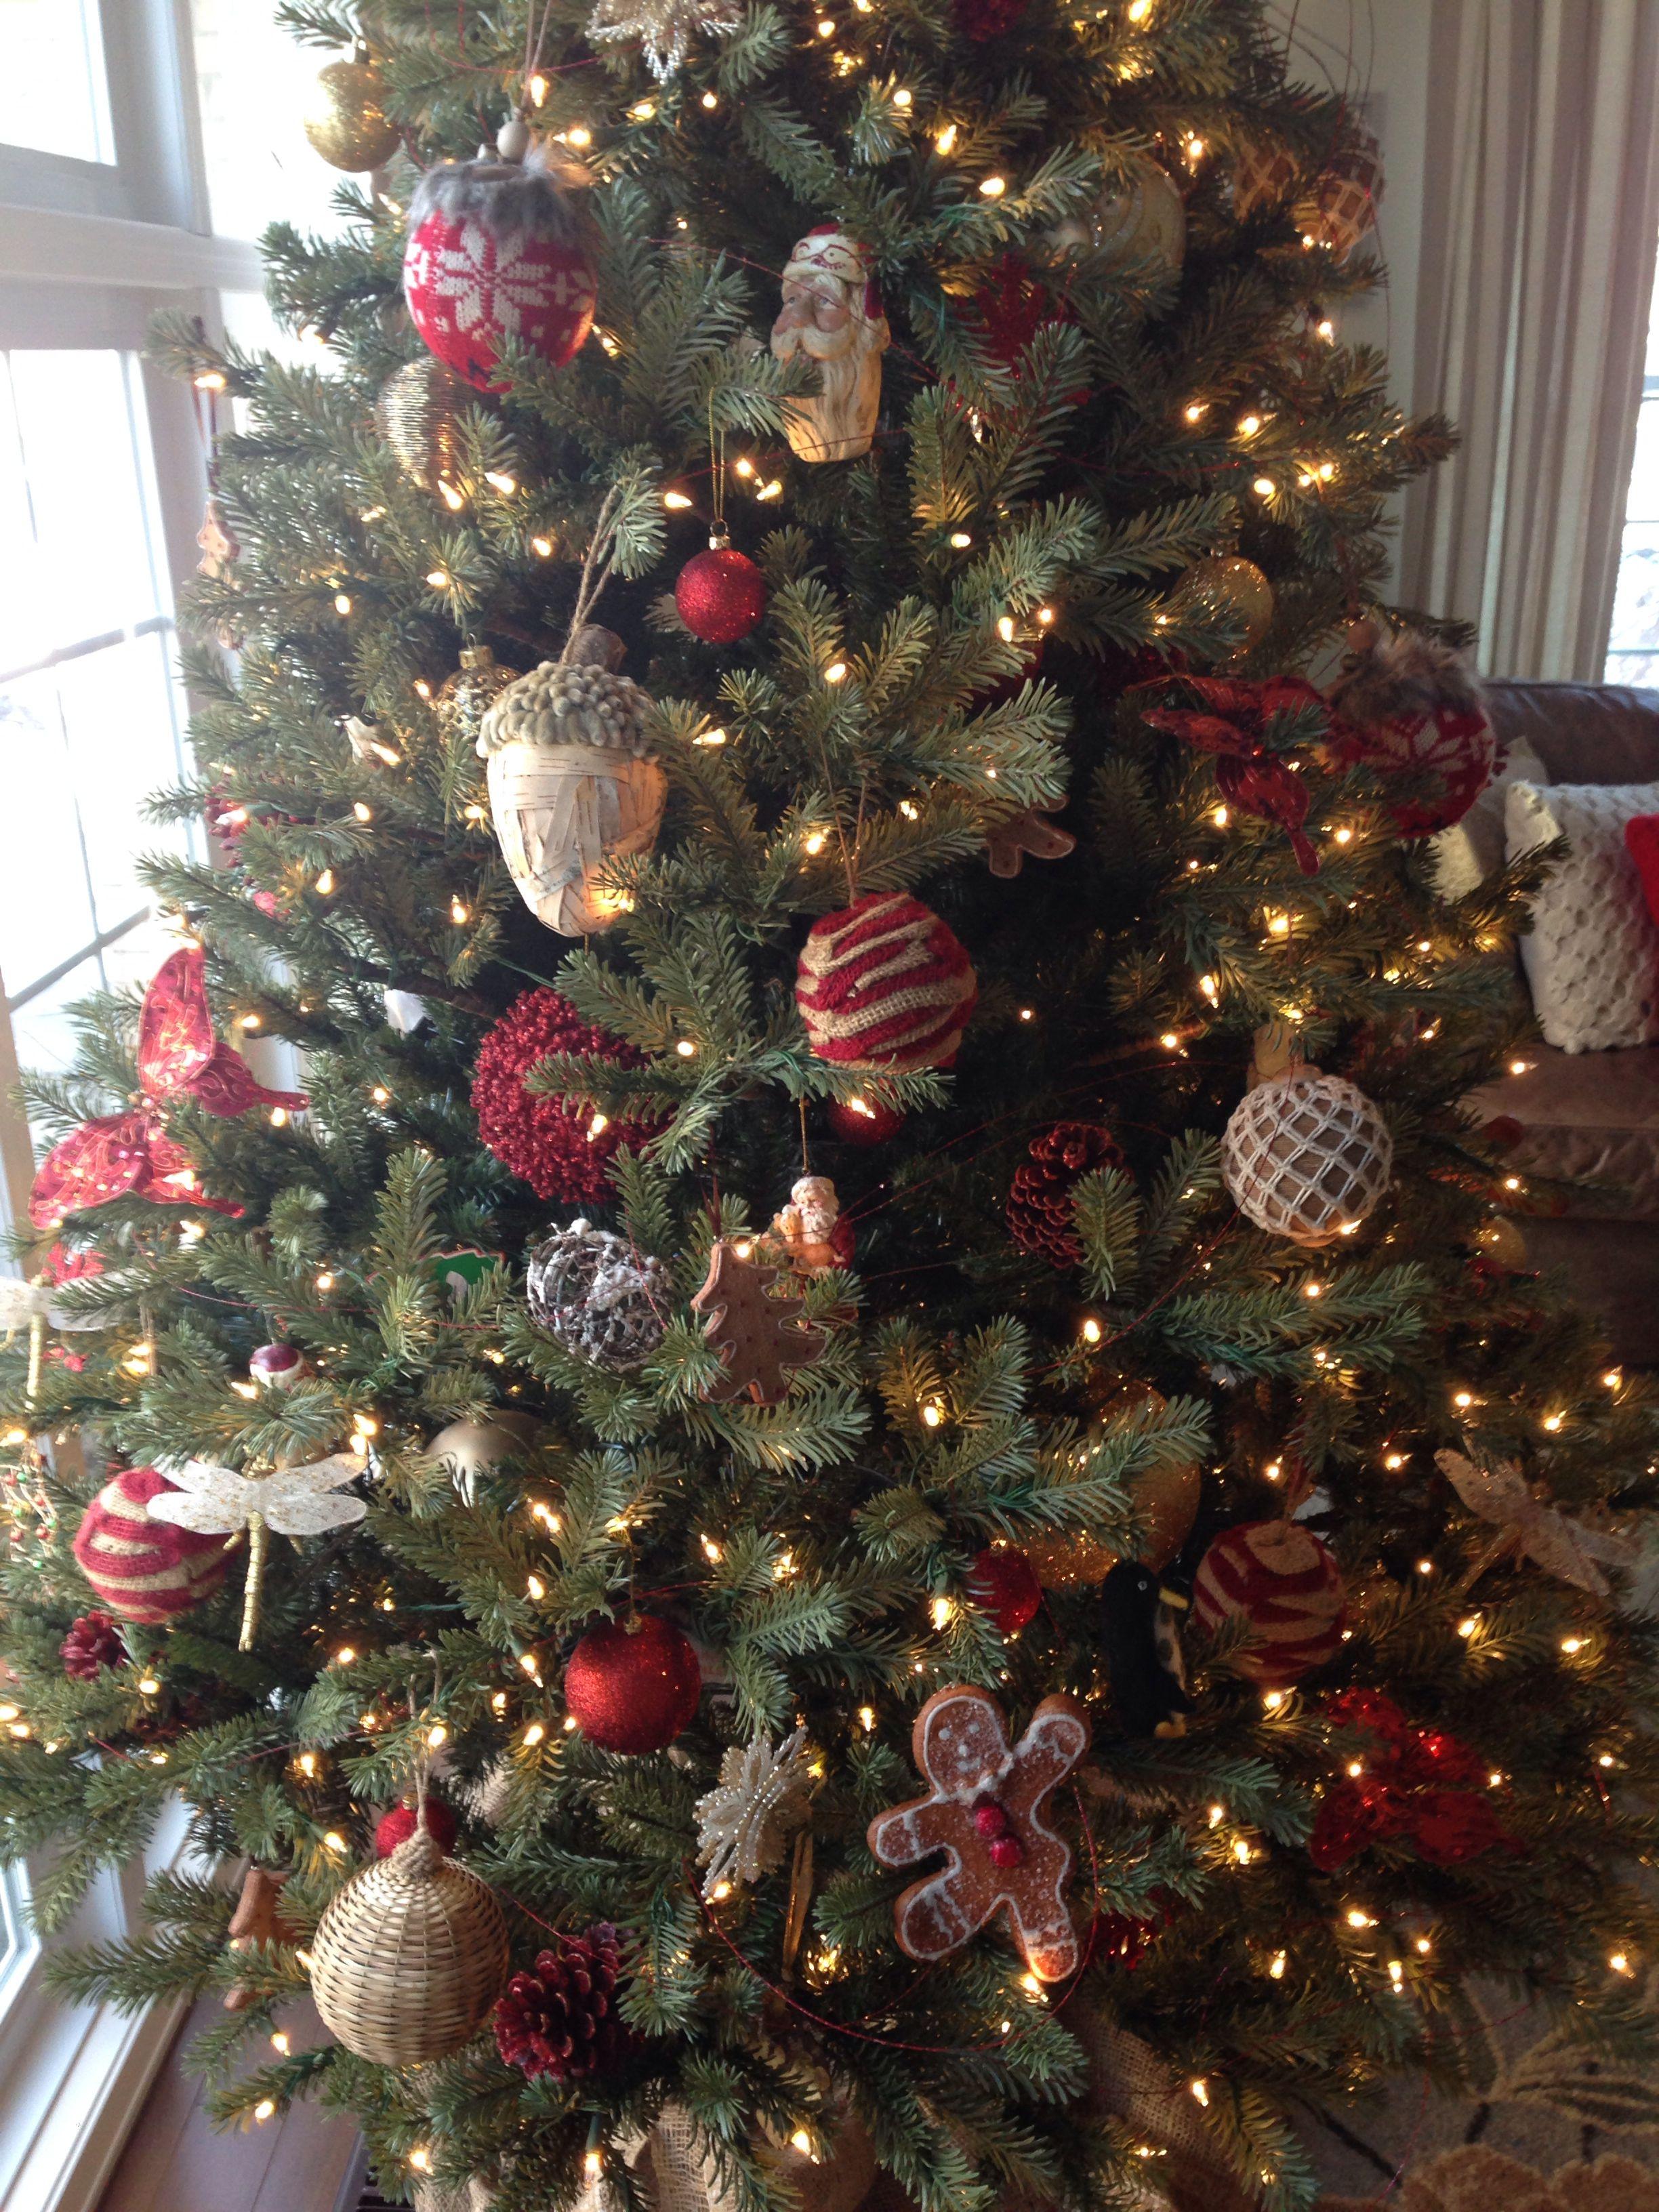 christmas tree decorating ideas woodsy theme woodsychristmas - Woodsy Christmas Tree Decorations